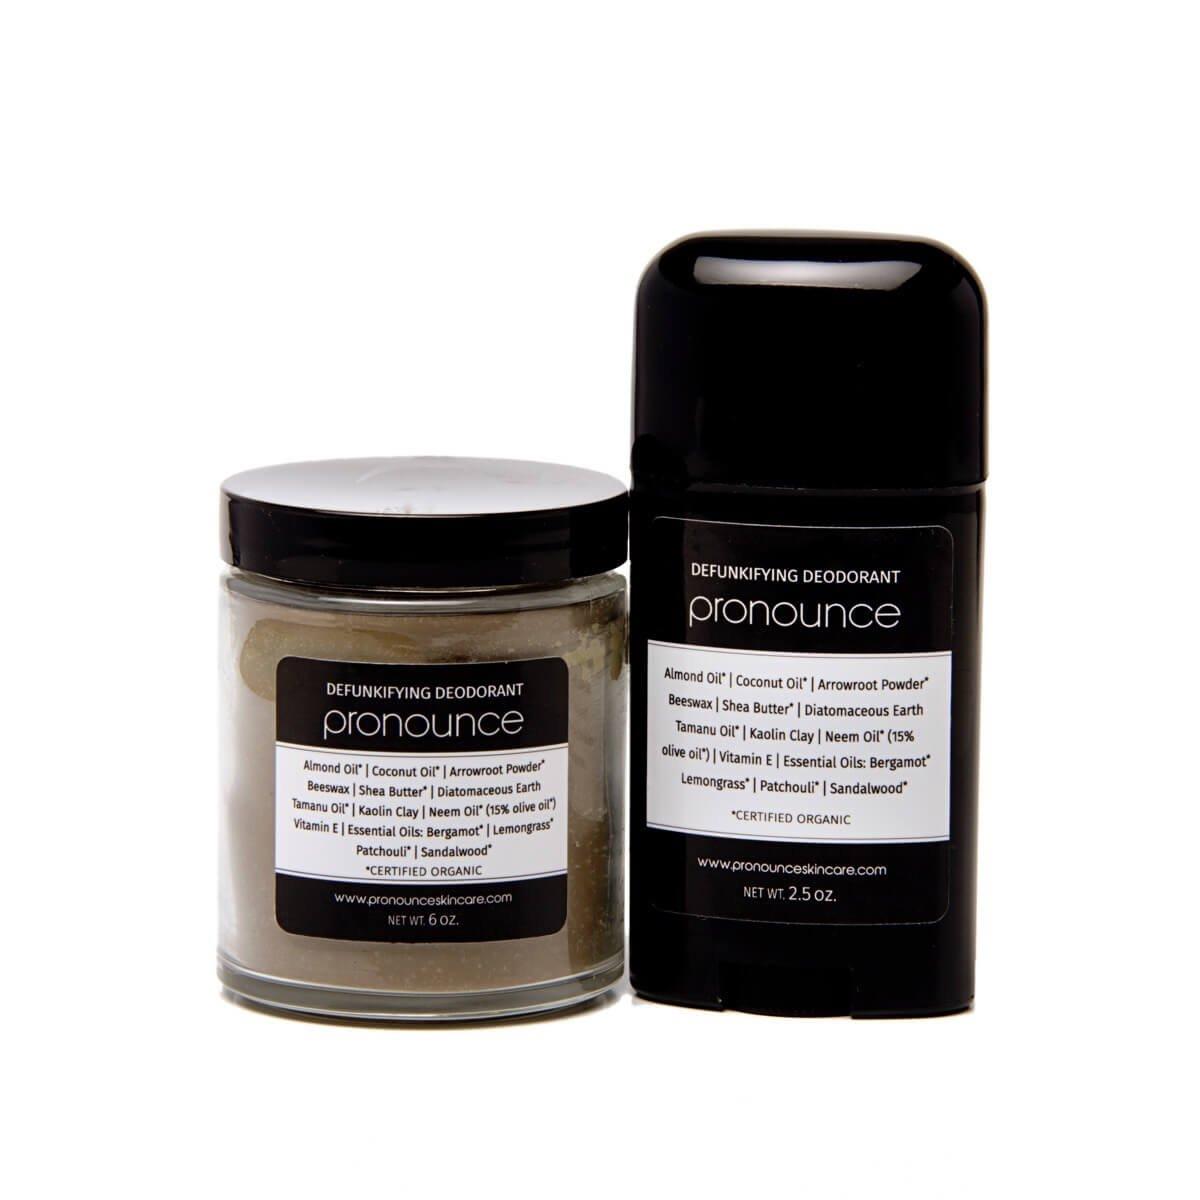 DeFunkifying Deodorant - Pronounce Skincare 1200 x 1200